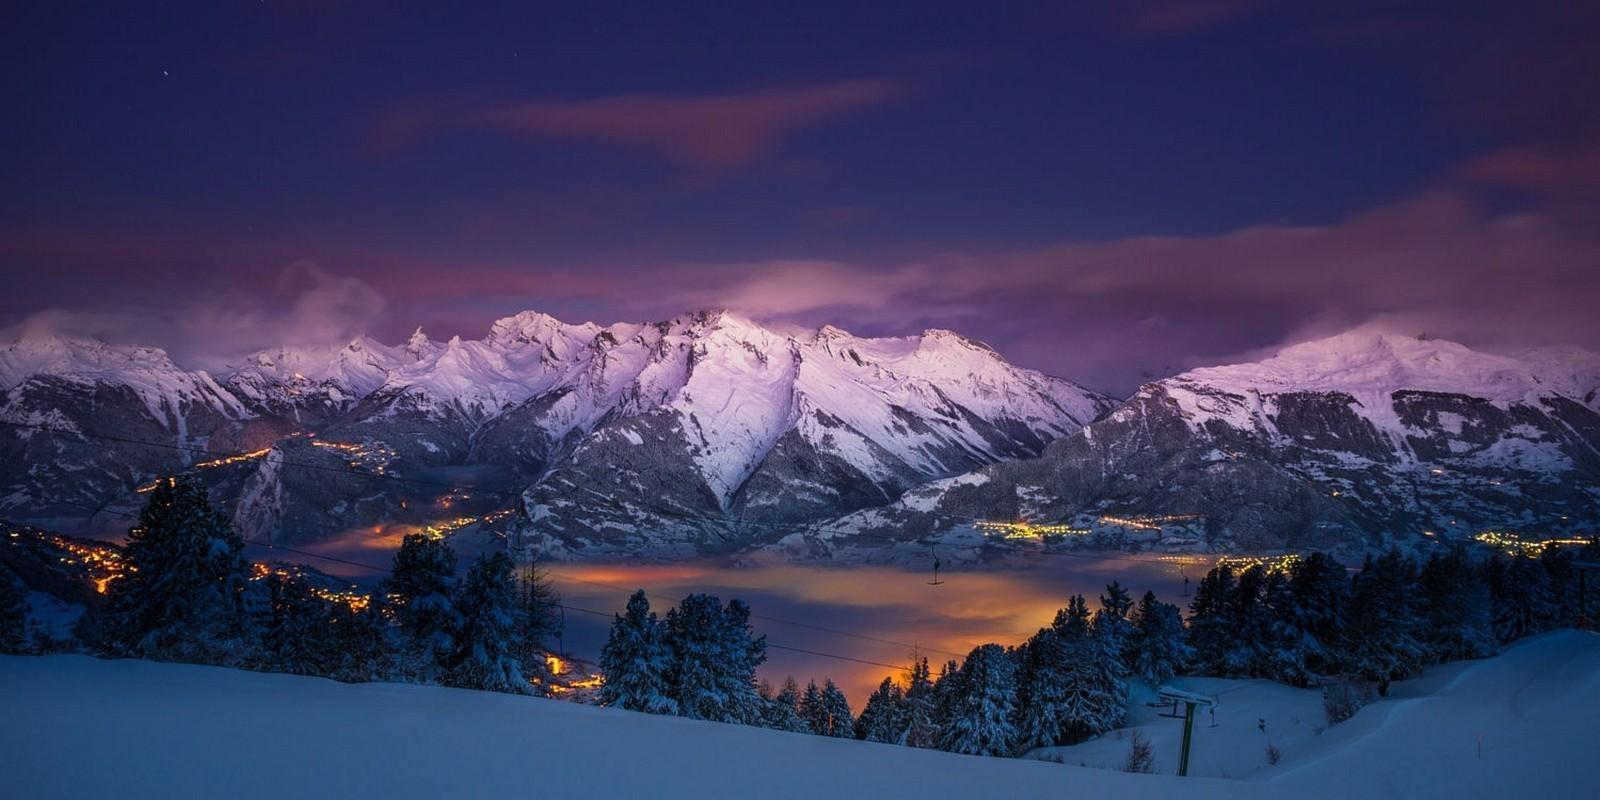 Sfondi Alberi Paesaggio Luci Montagne Citt Notte